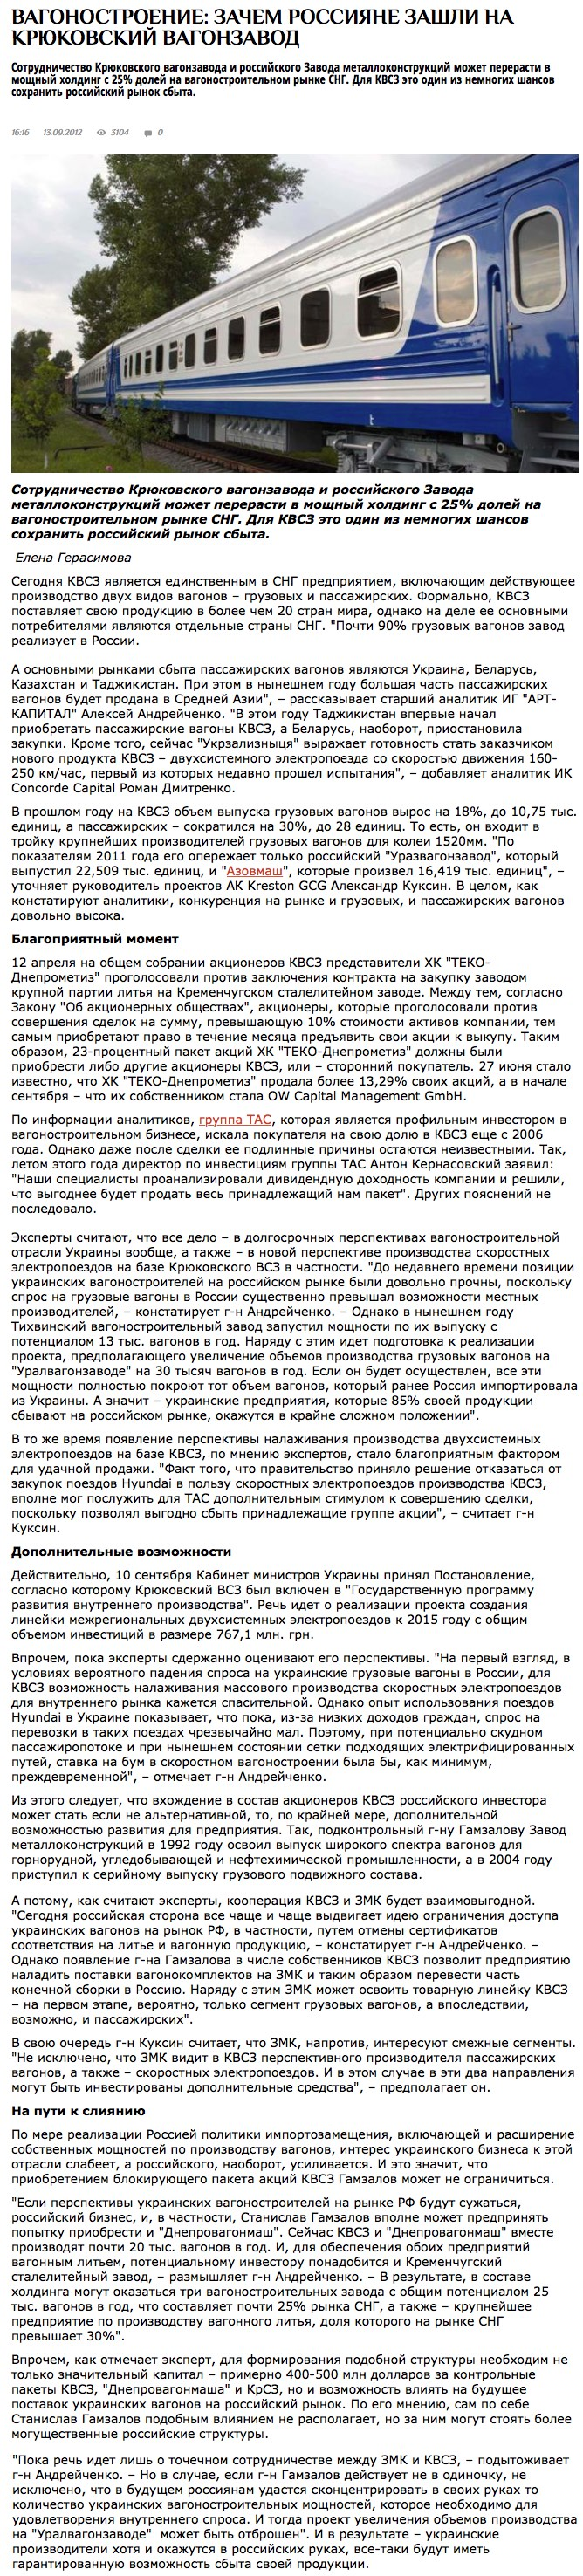 АНАЛИТИКА   ЛОГИСТИКА, Вагоностроение: зачем россияне зашли на Крюковский вагонзавод